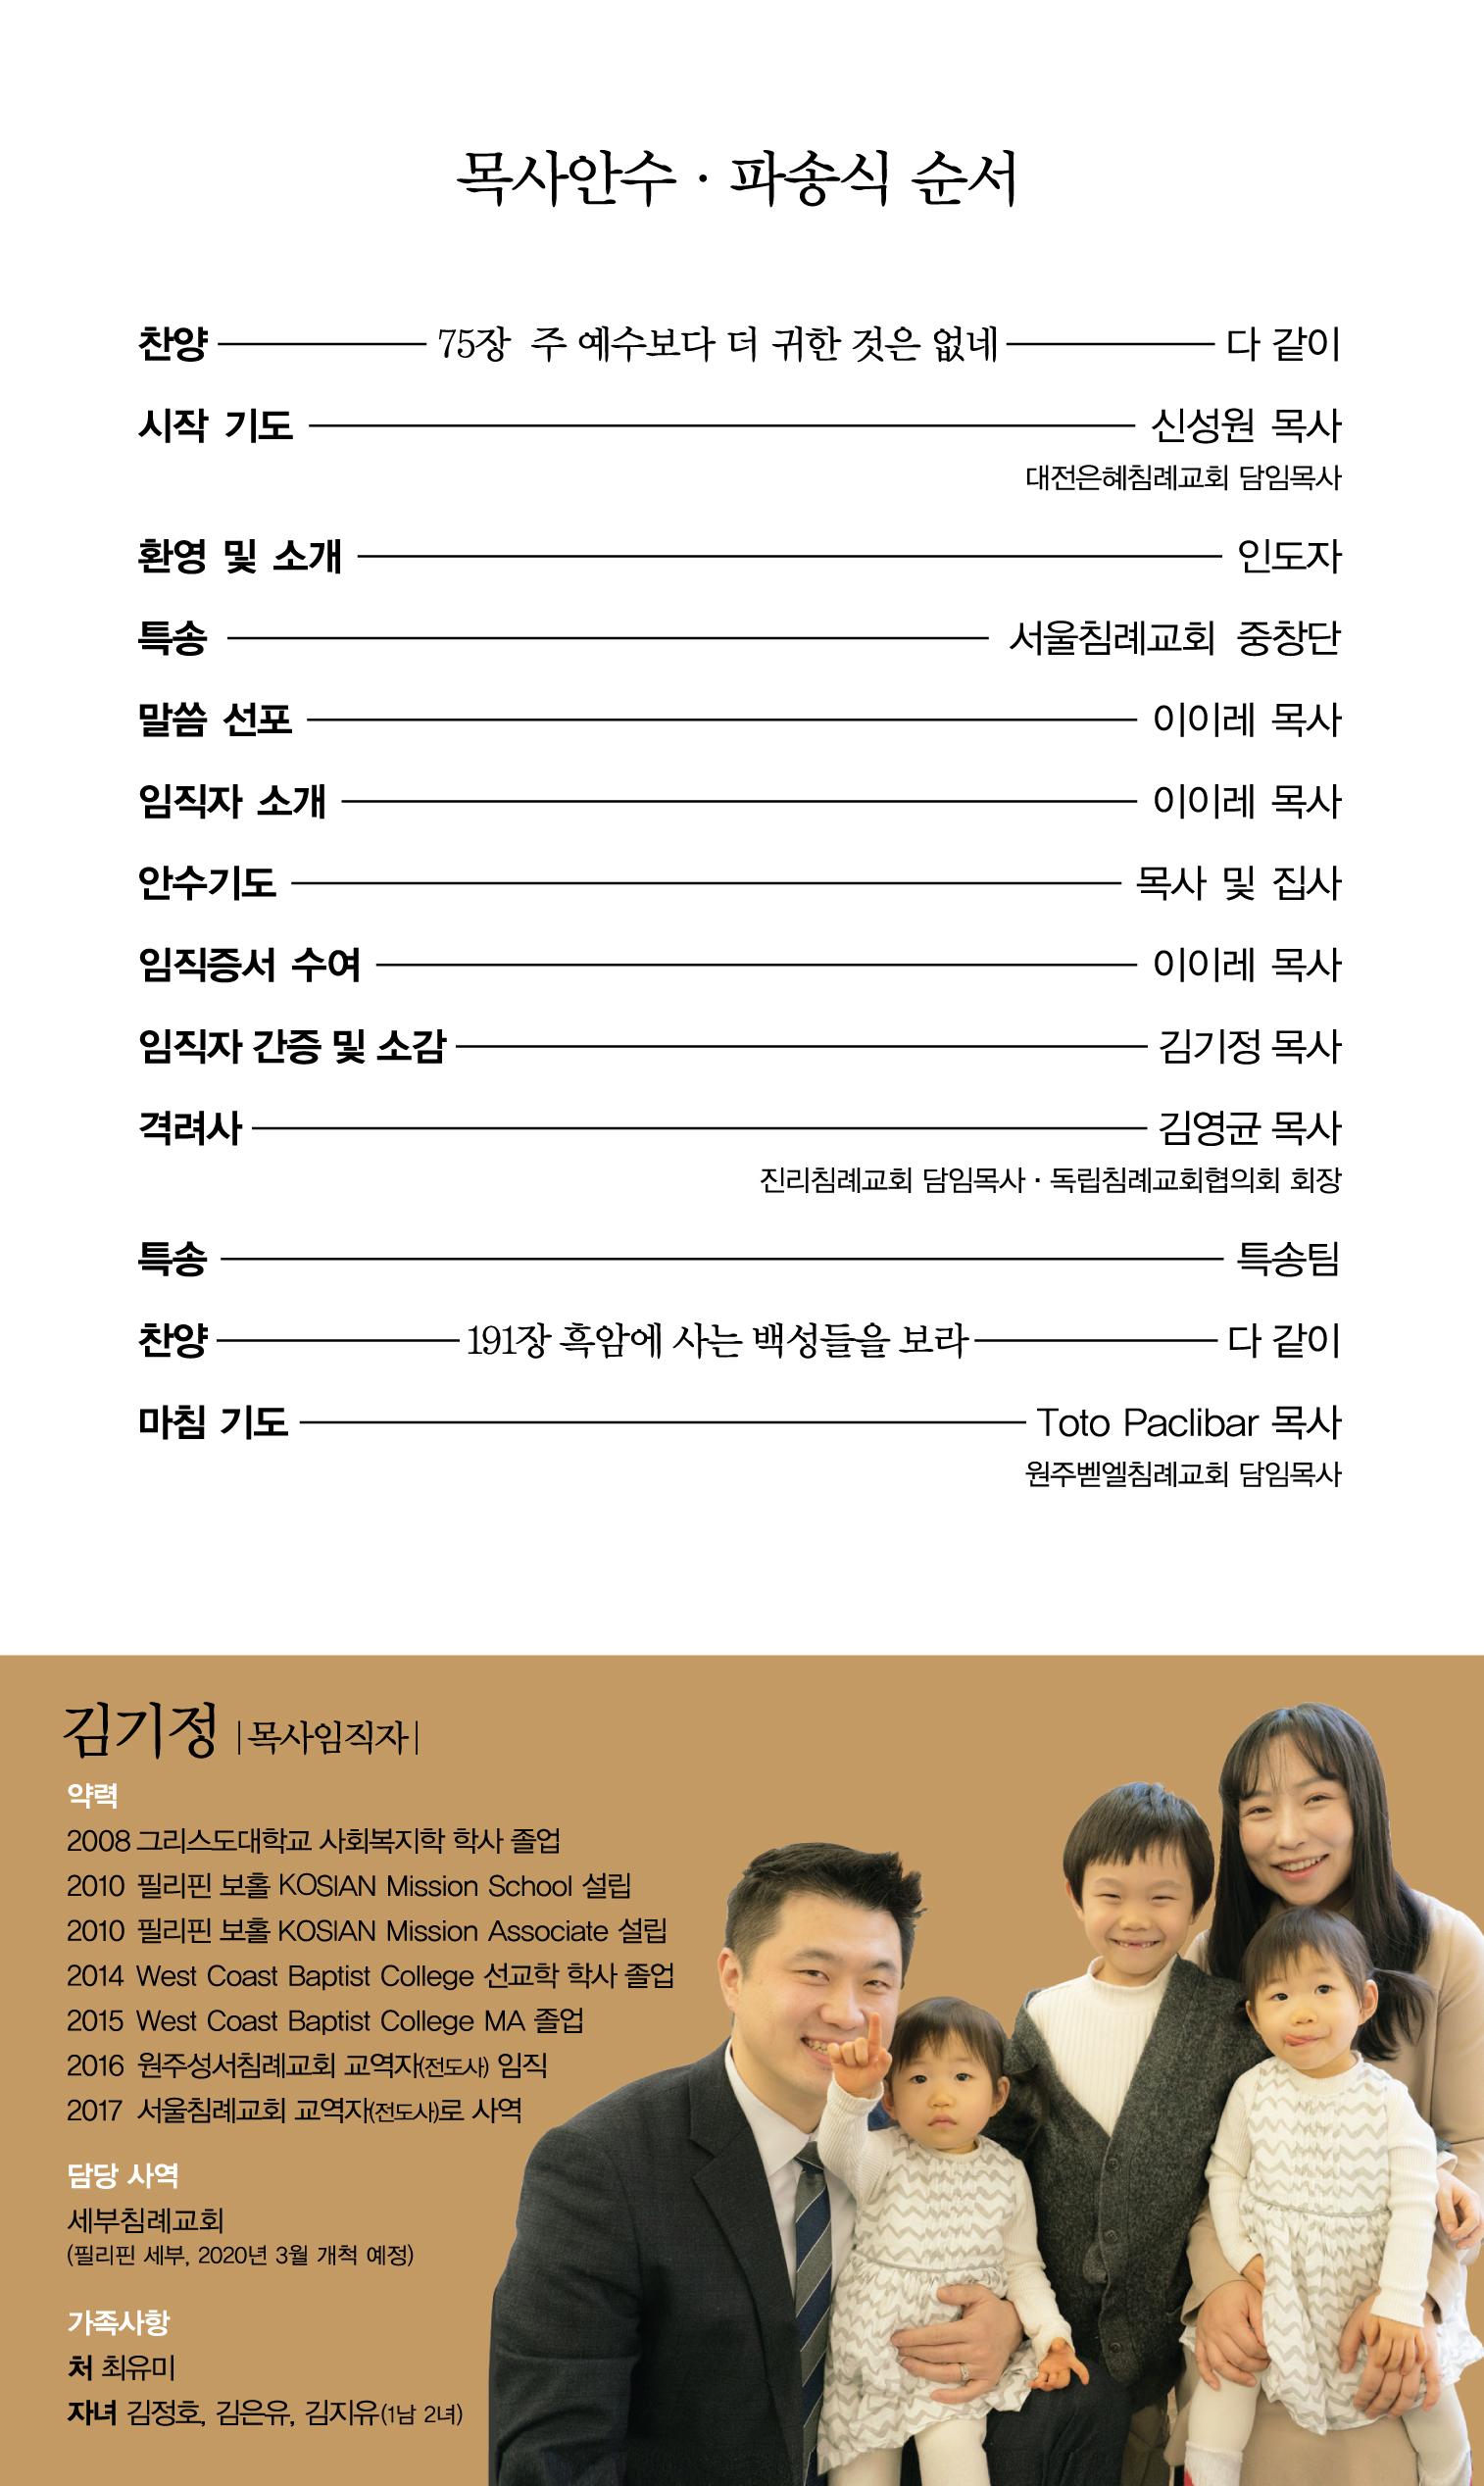 KakaoTalk_Photo_2019-12-13-01-53-15.jpeg